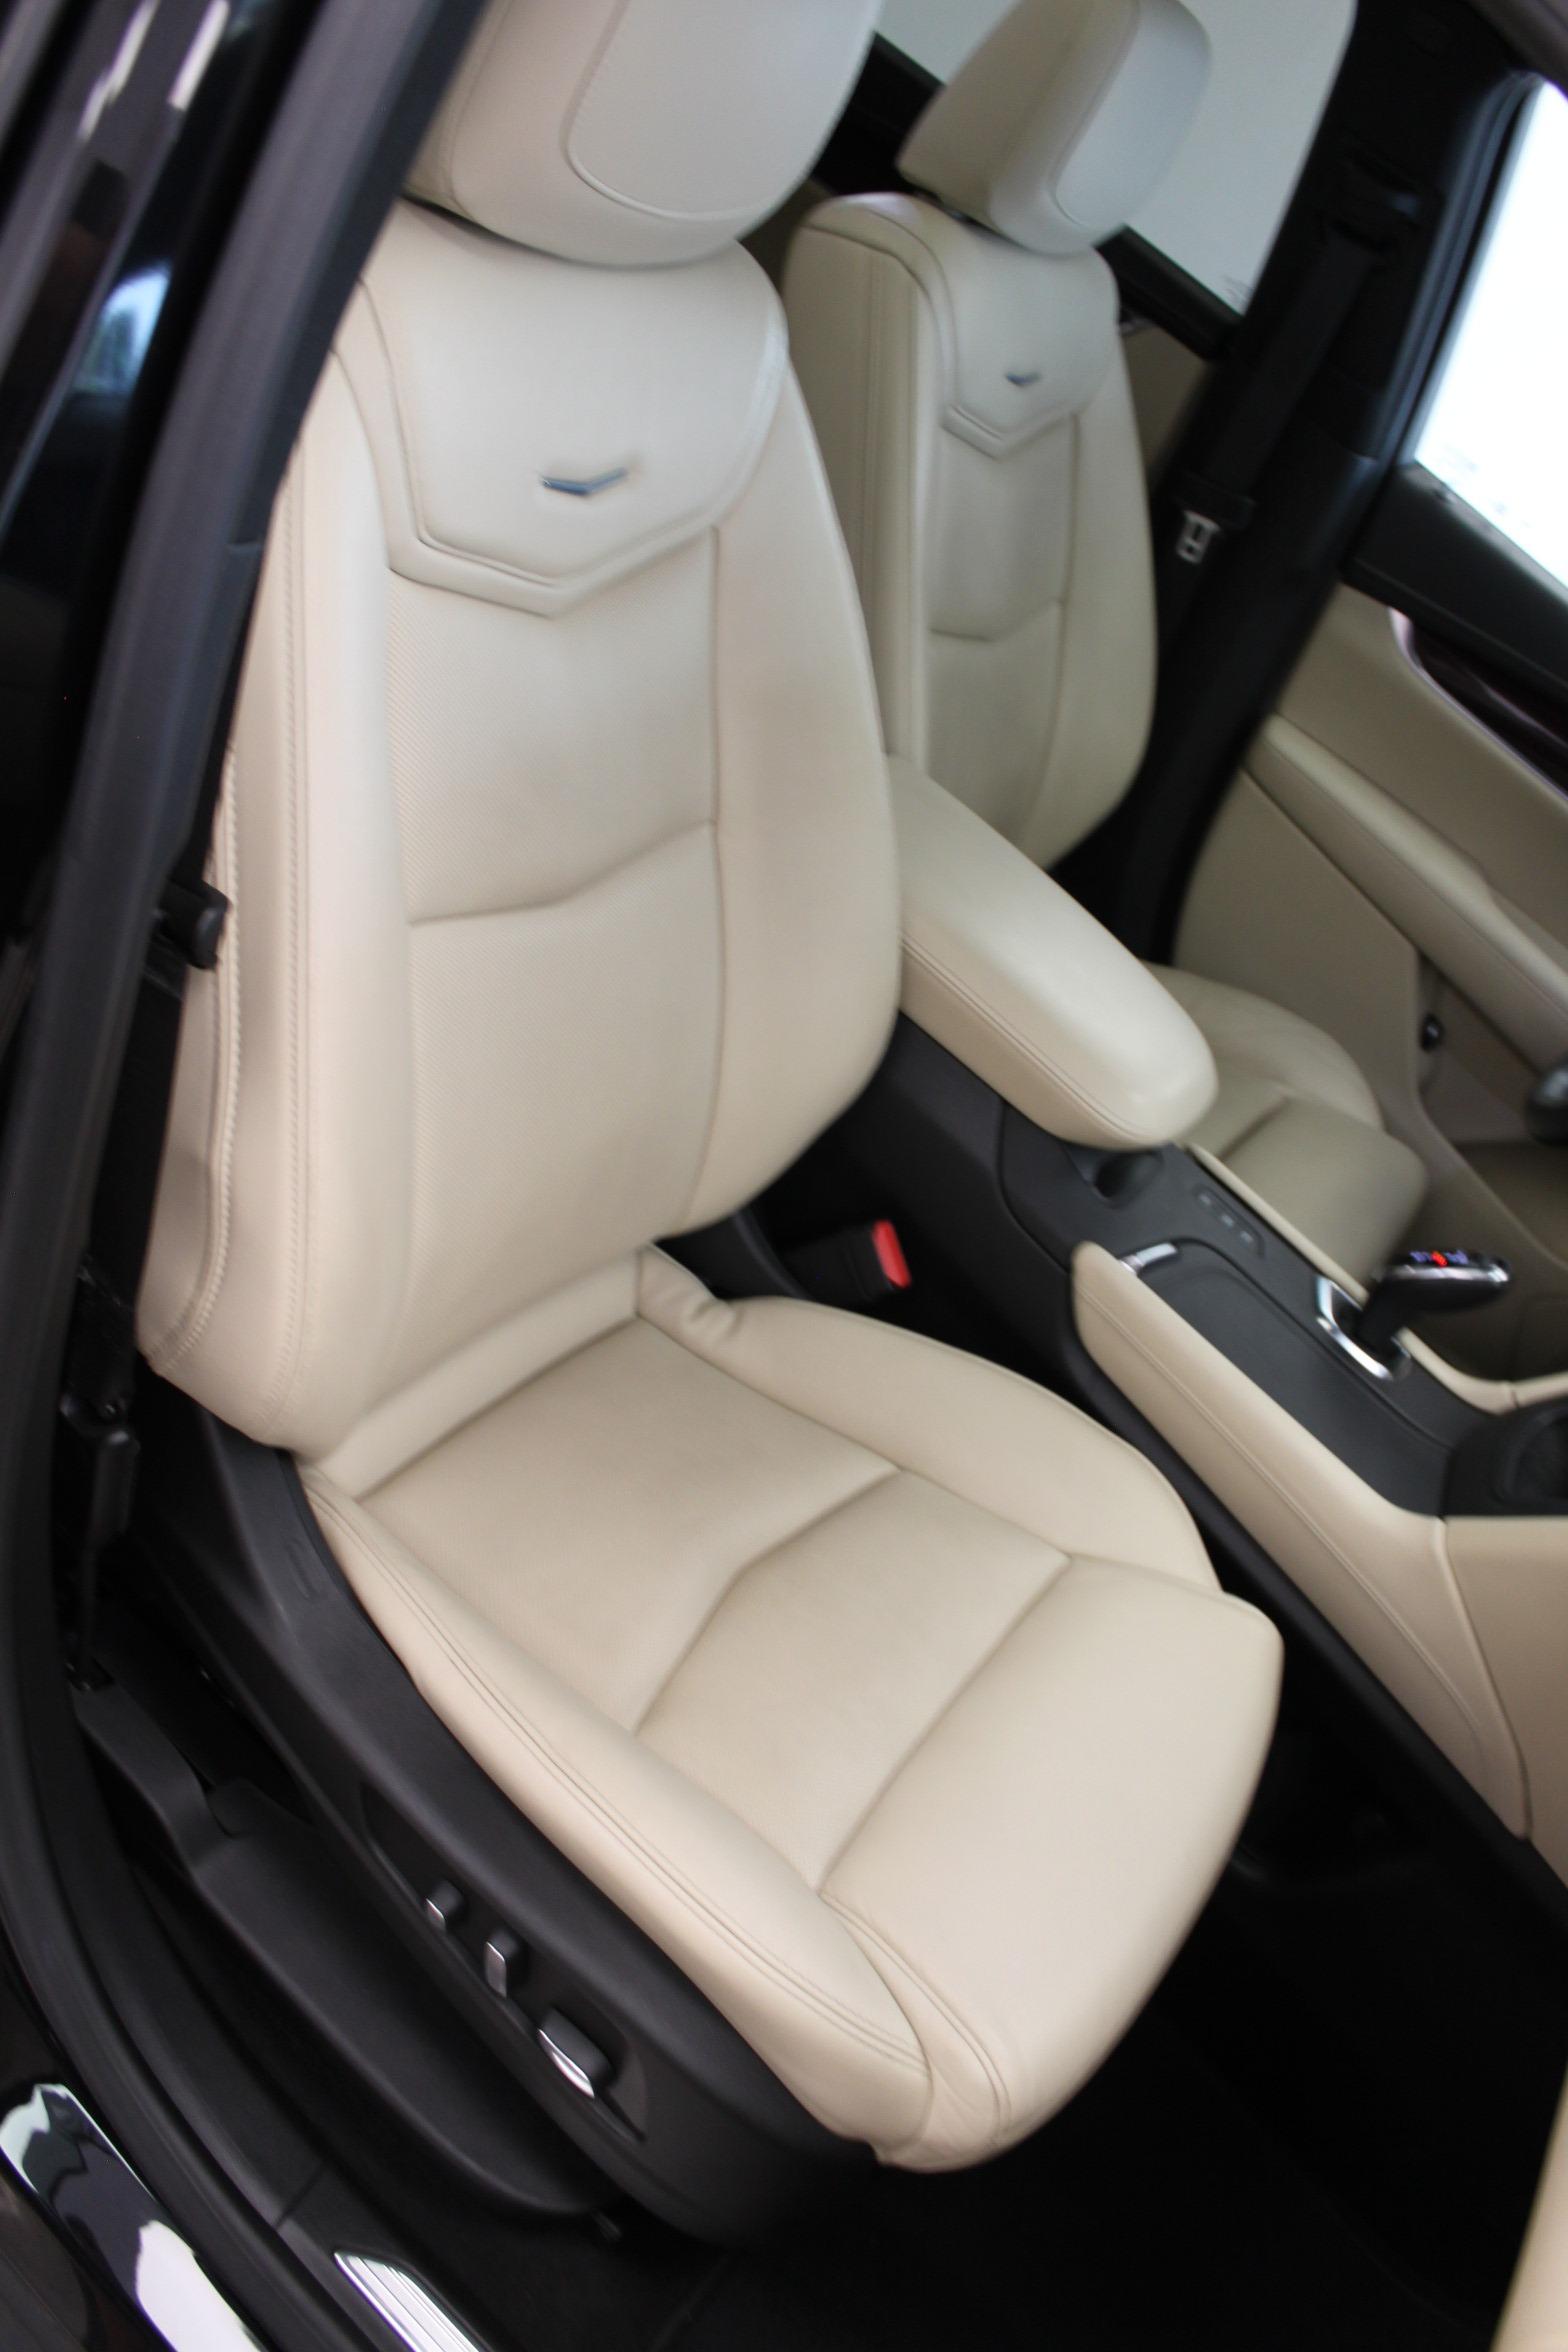 Used-2017-Cadillac-XT5-Luxury-All-Wheel-Drive-Luxury-AWD-Chalenger